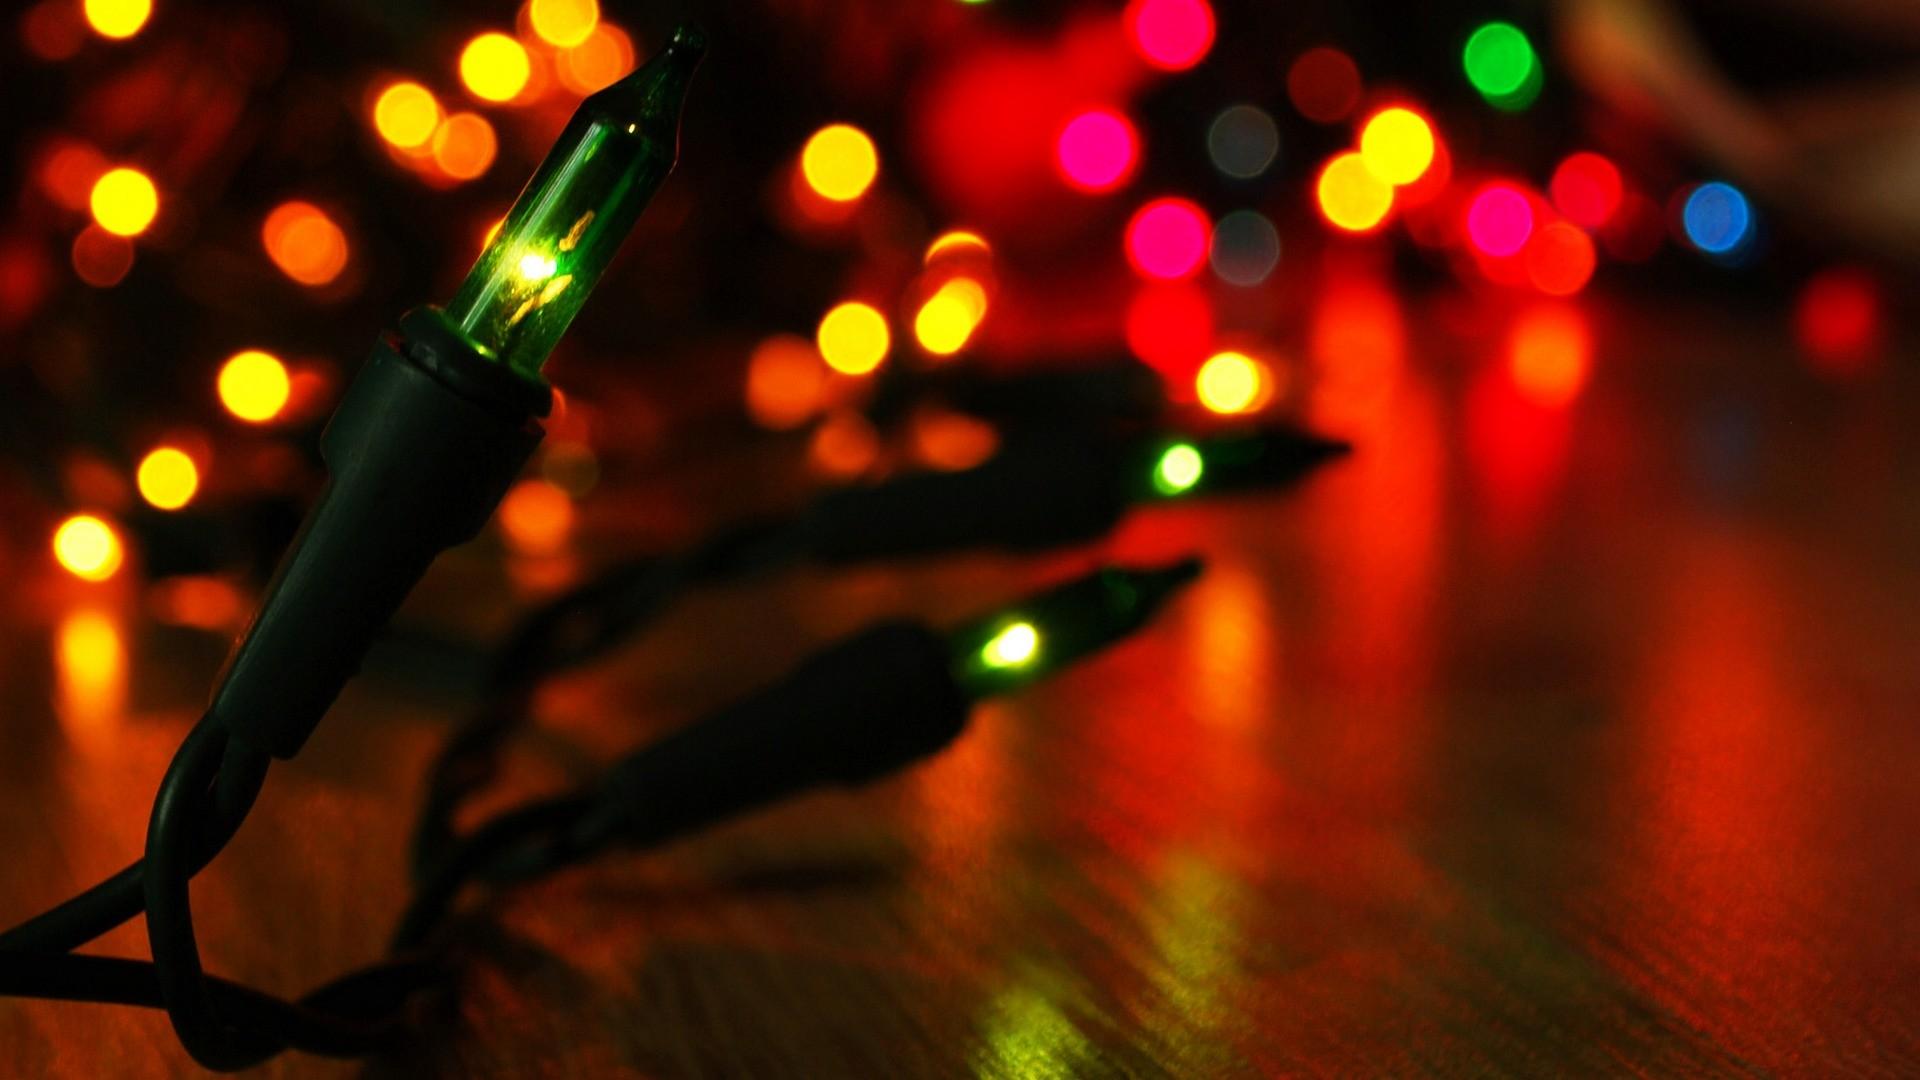 christmas lights desktop wallpaper – www.wallpapers-in-hd.com